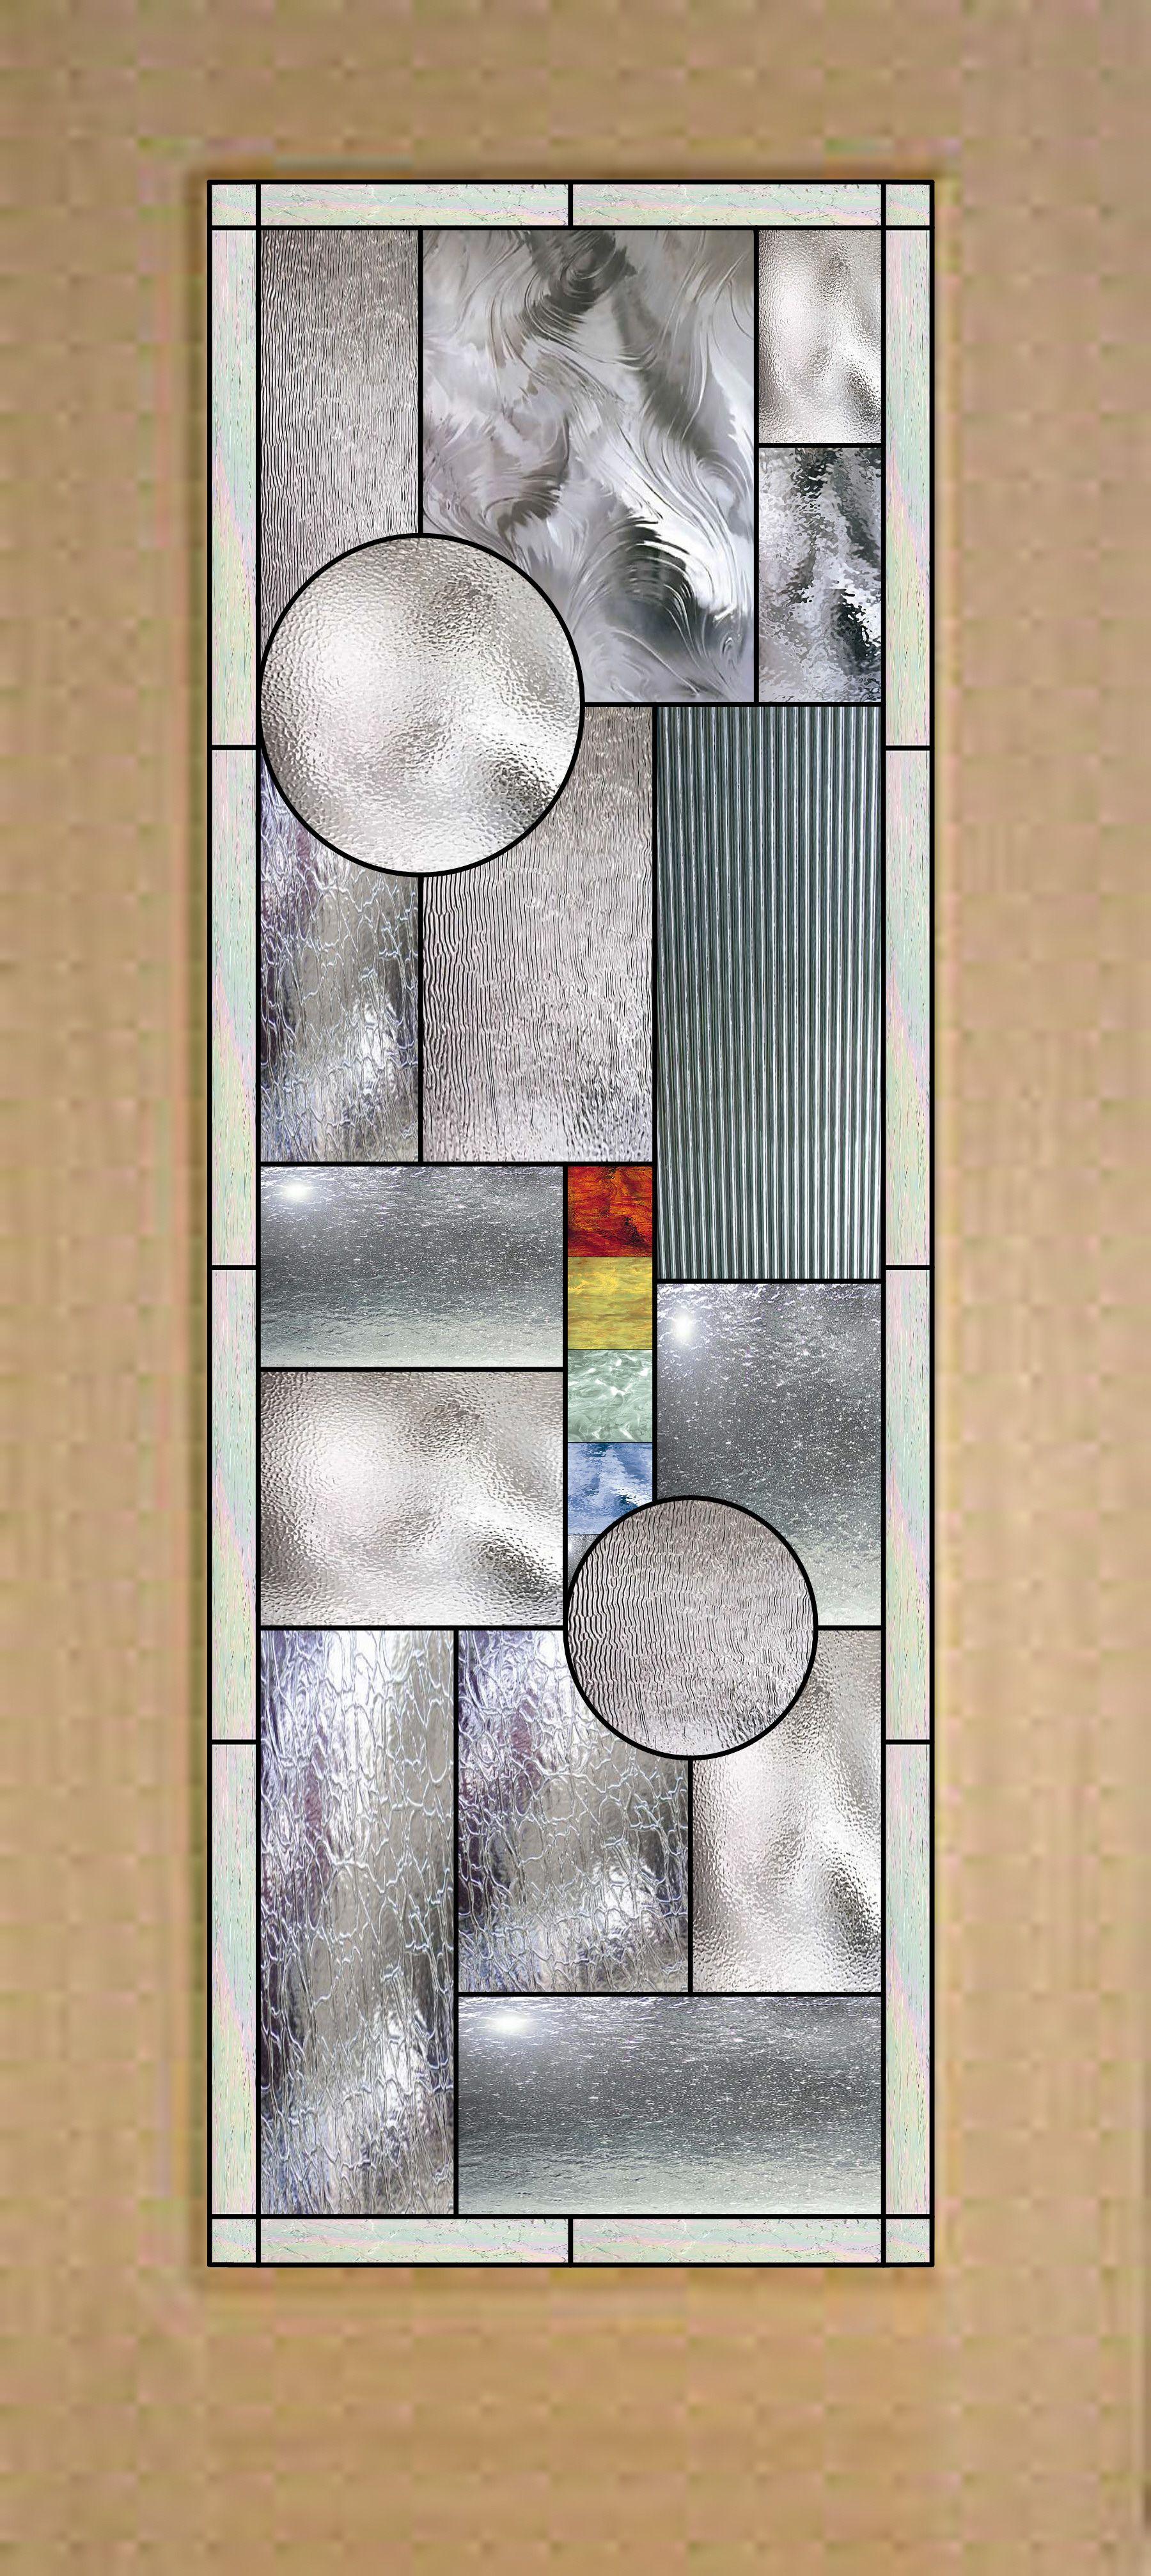 Awesome geometric stained glass door 119900 plus shipping elegant stock sized stained glass by artglasswindows on etsy planetlyrics Images